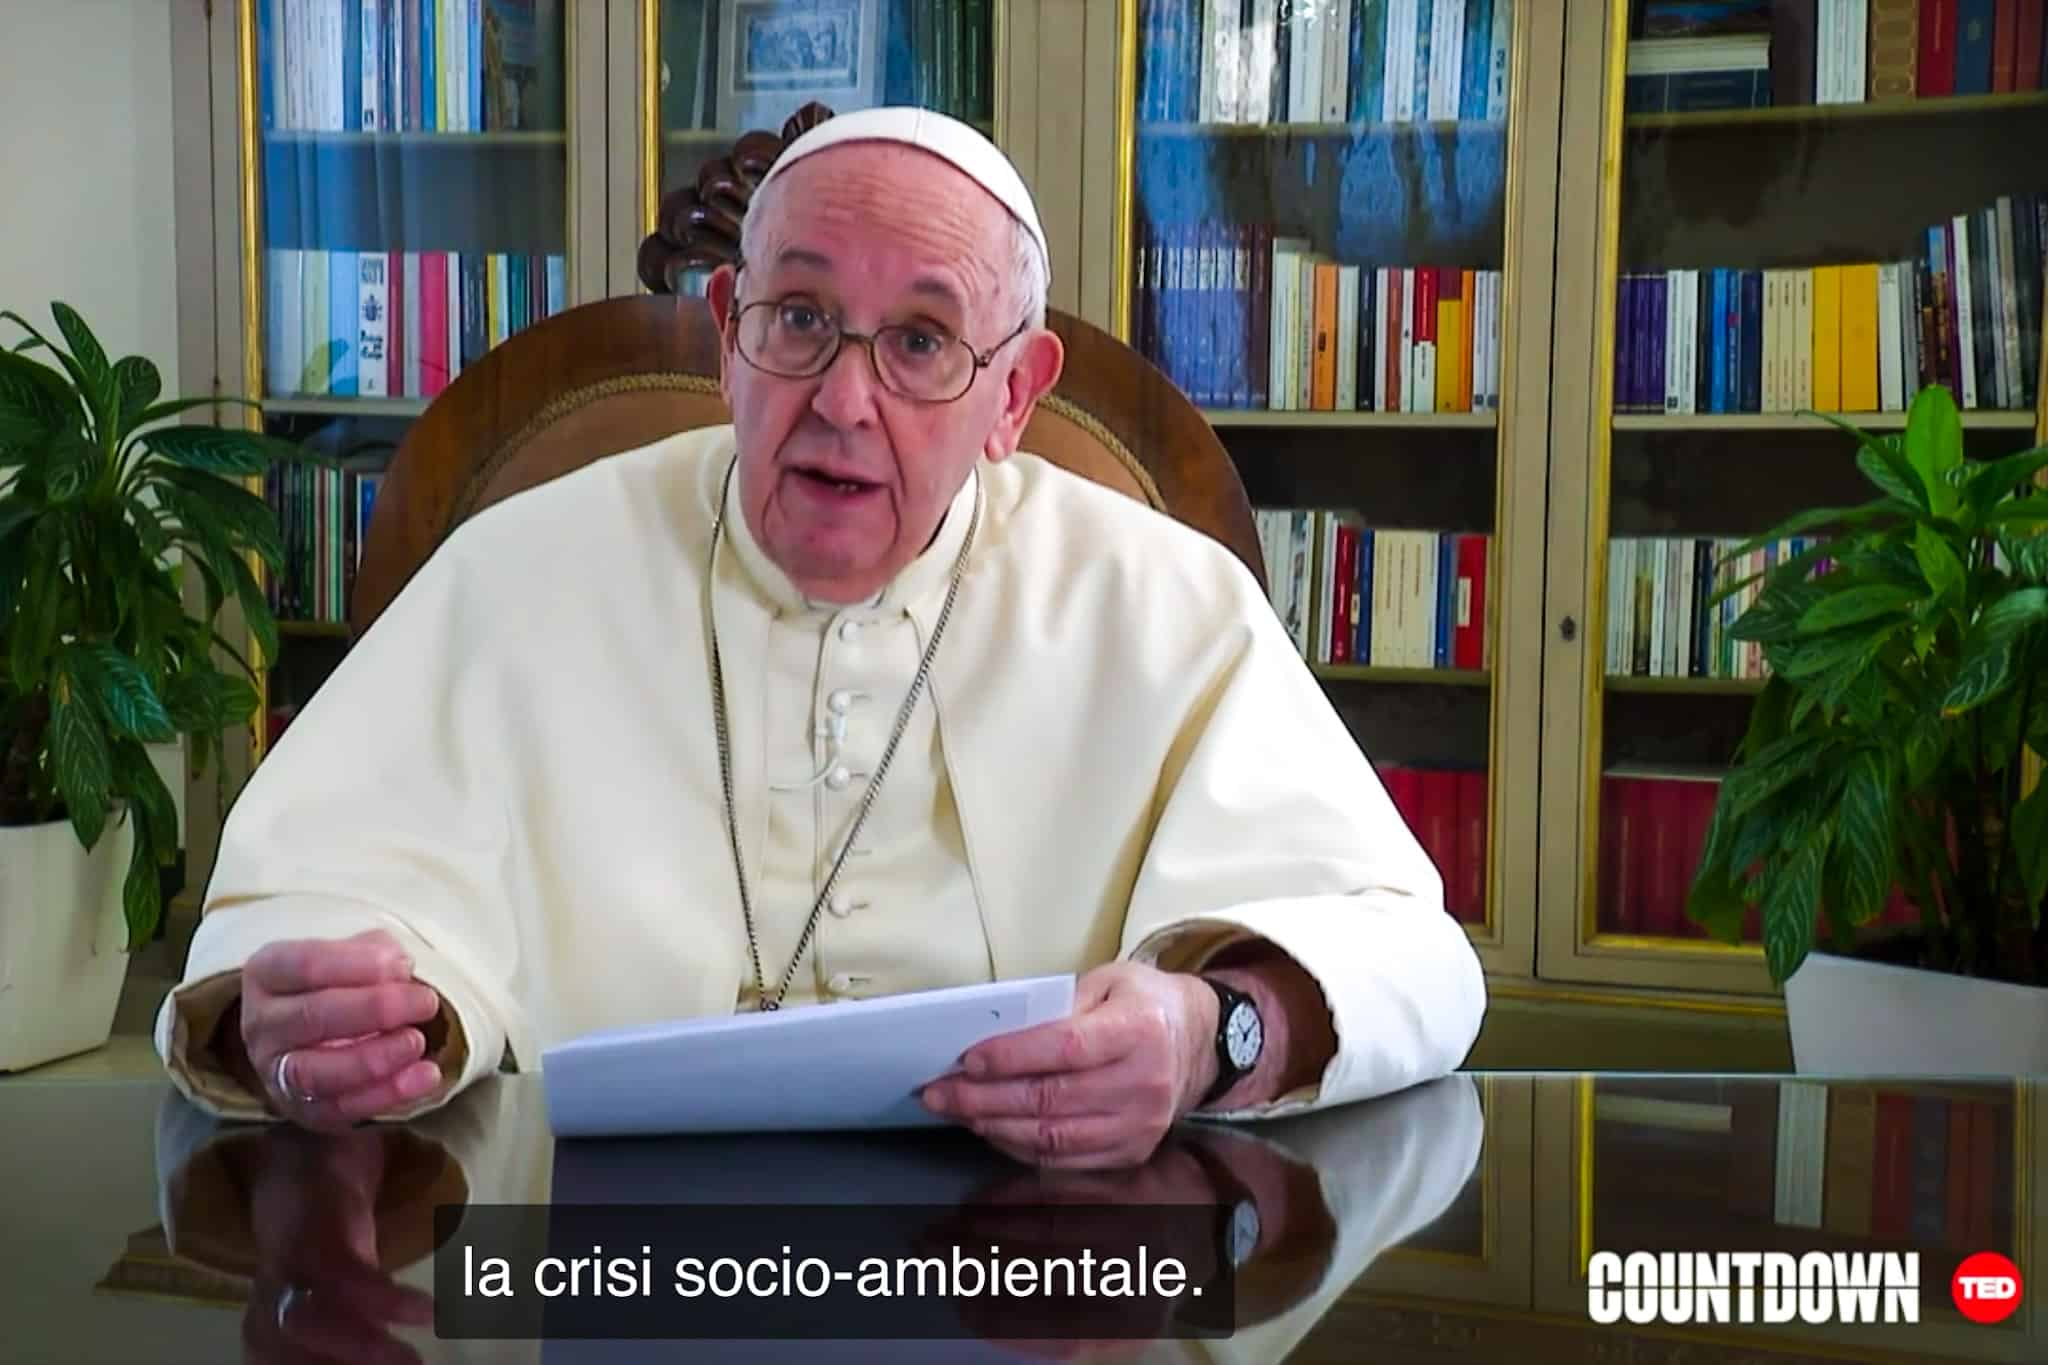 Papa Francesco messaggio TED ottobre 2020 (screenshot)